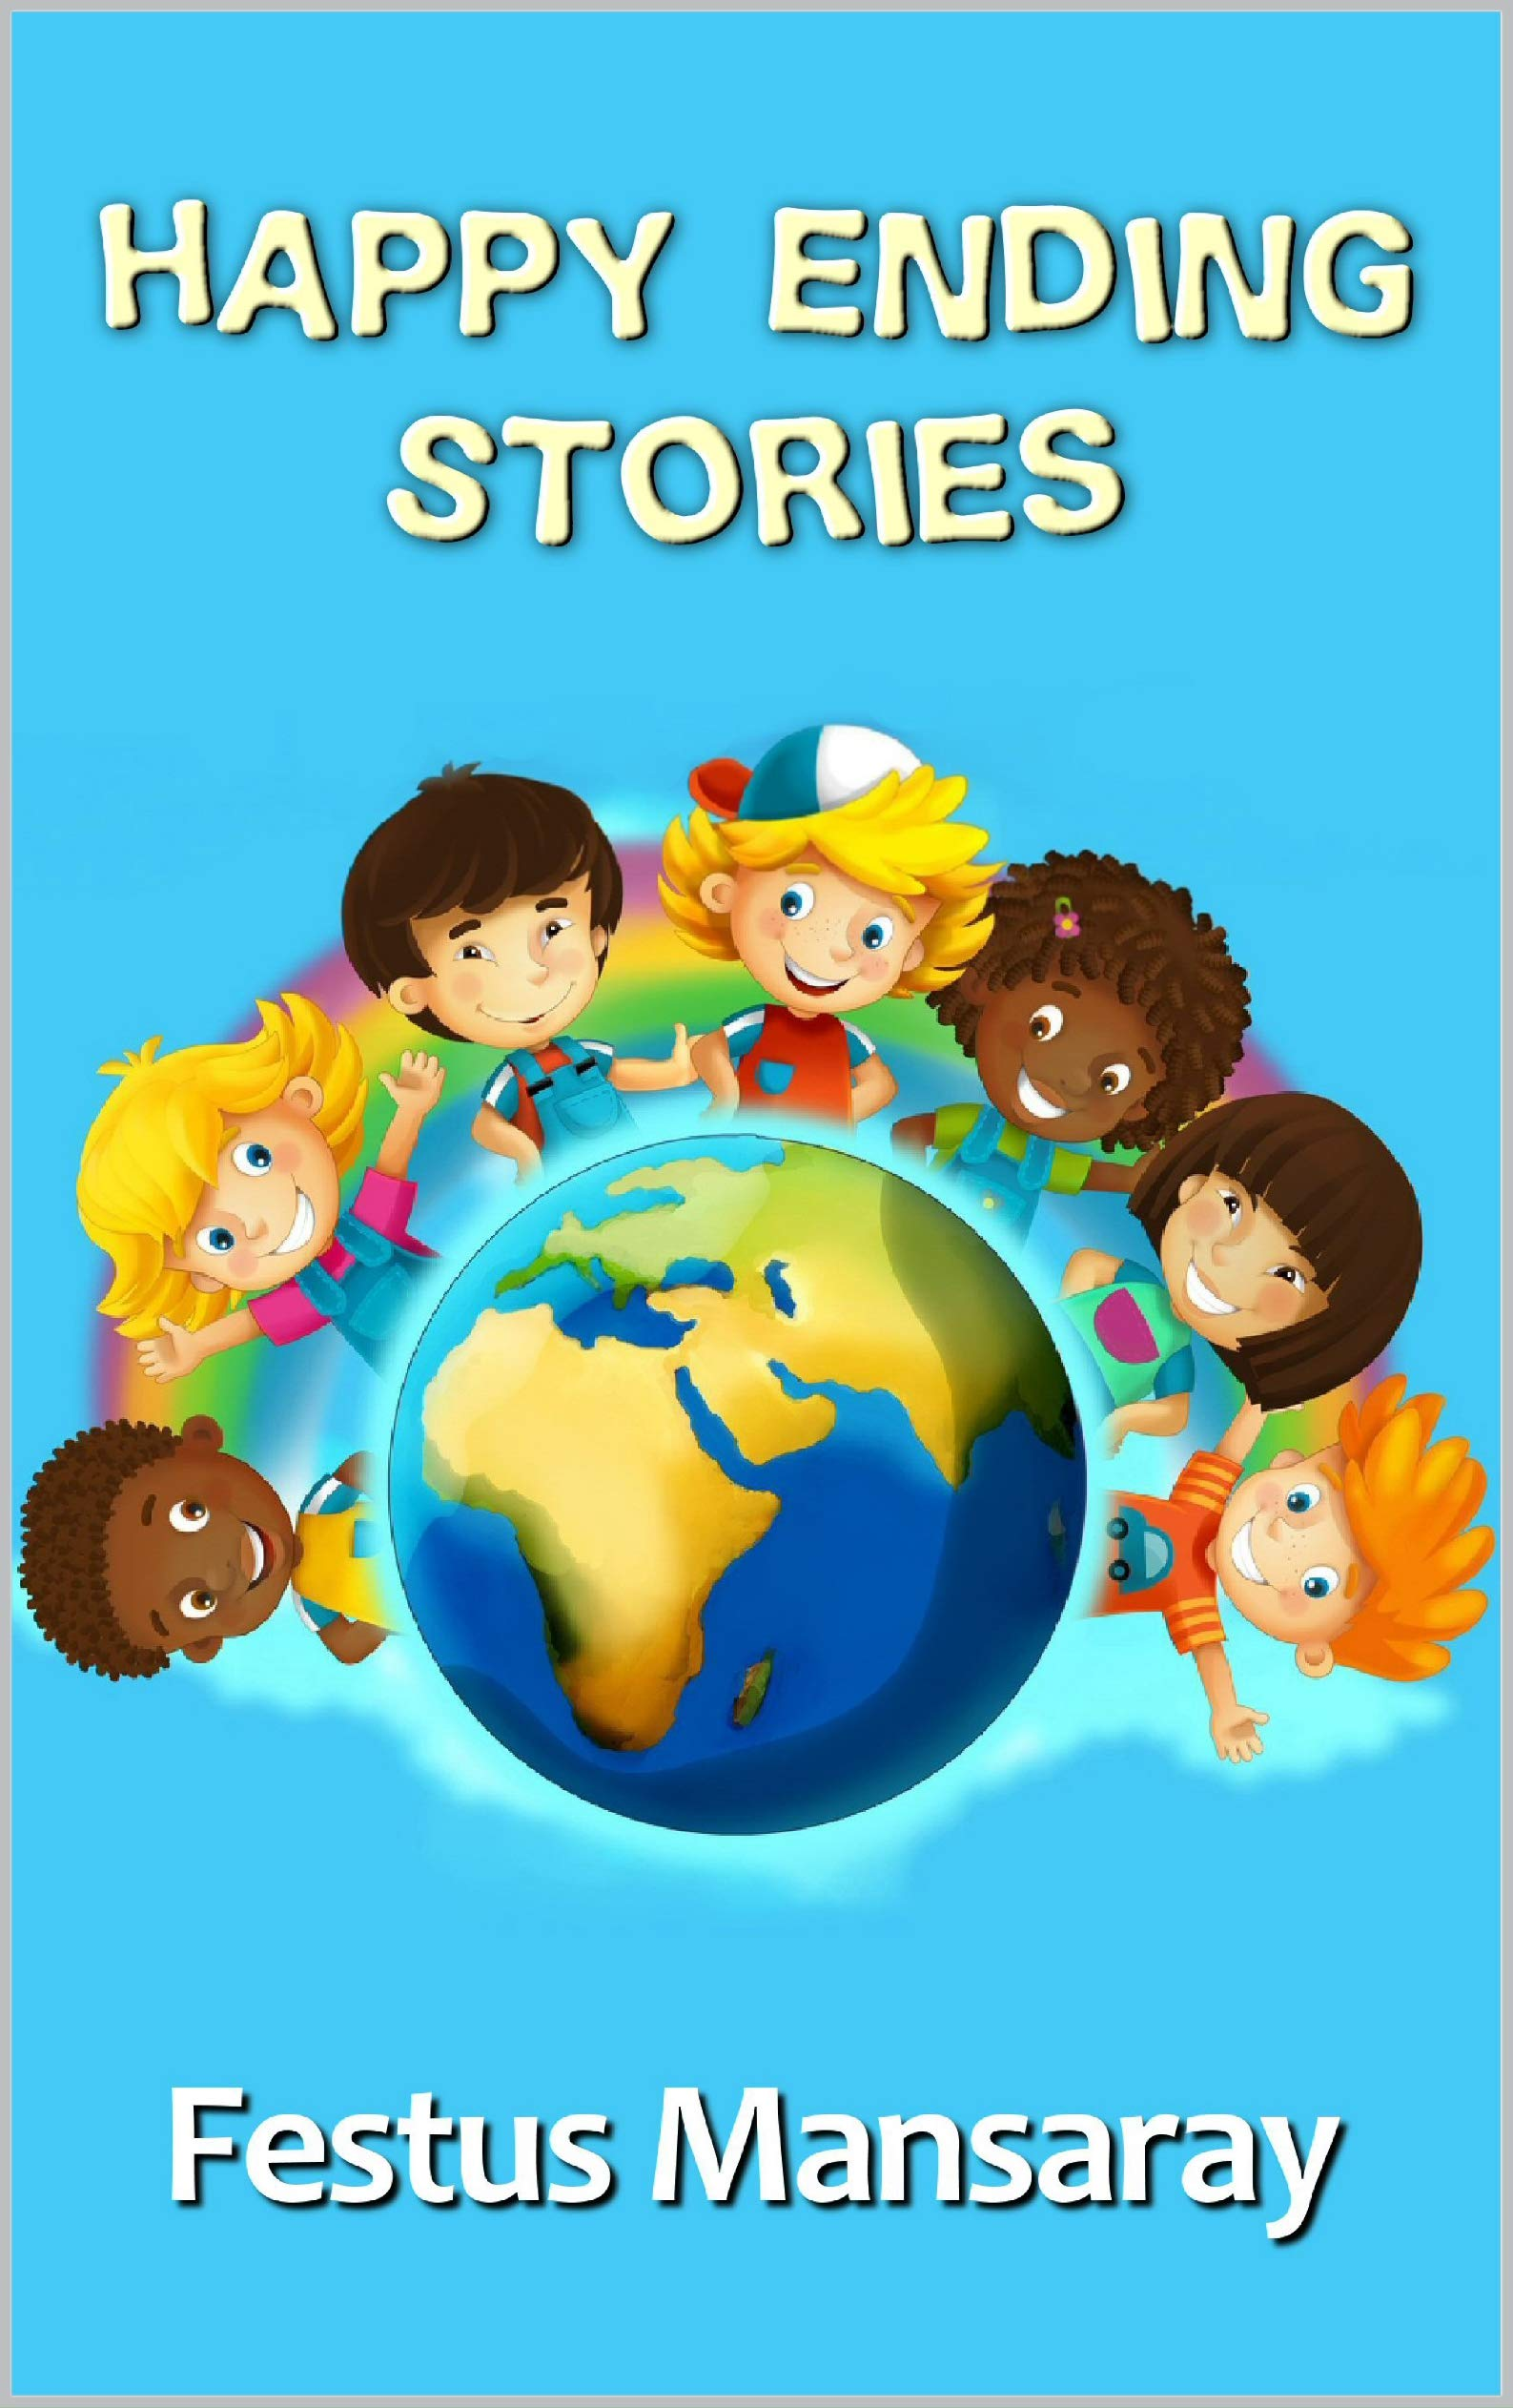 Happy Ending Stories